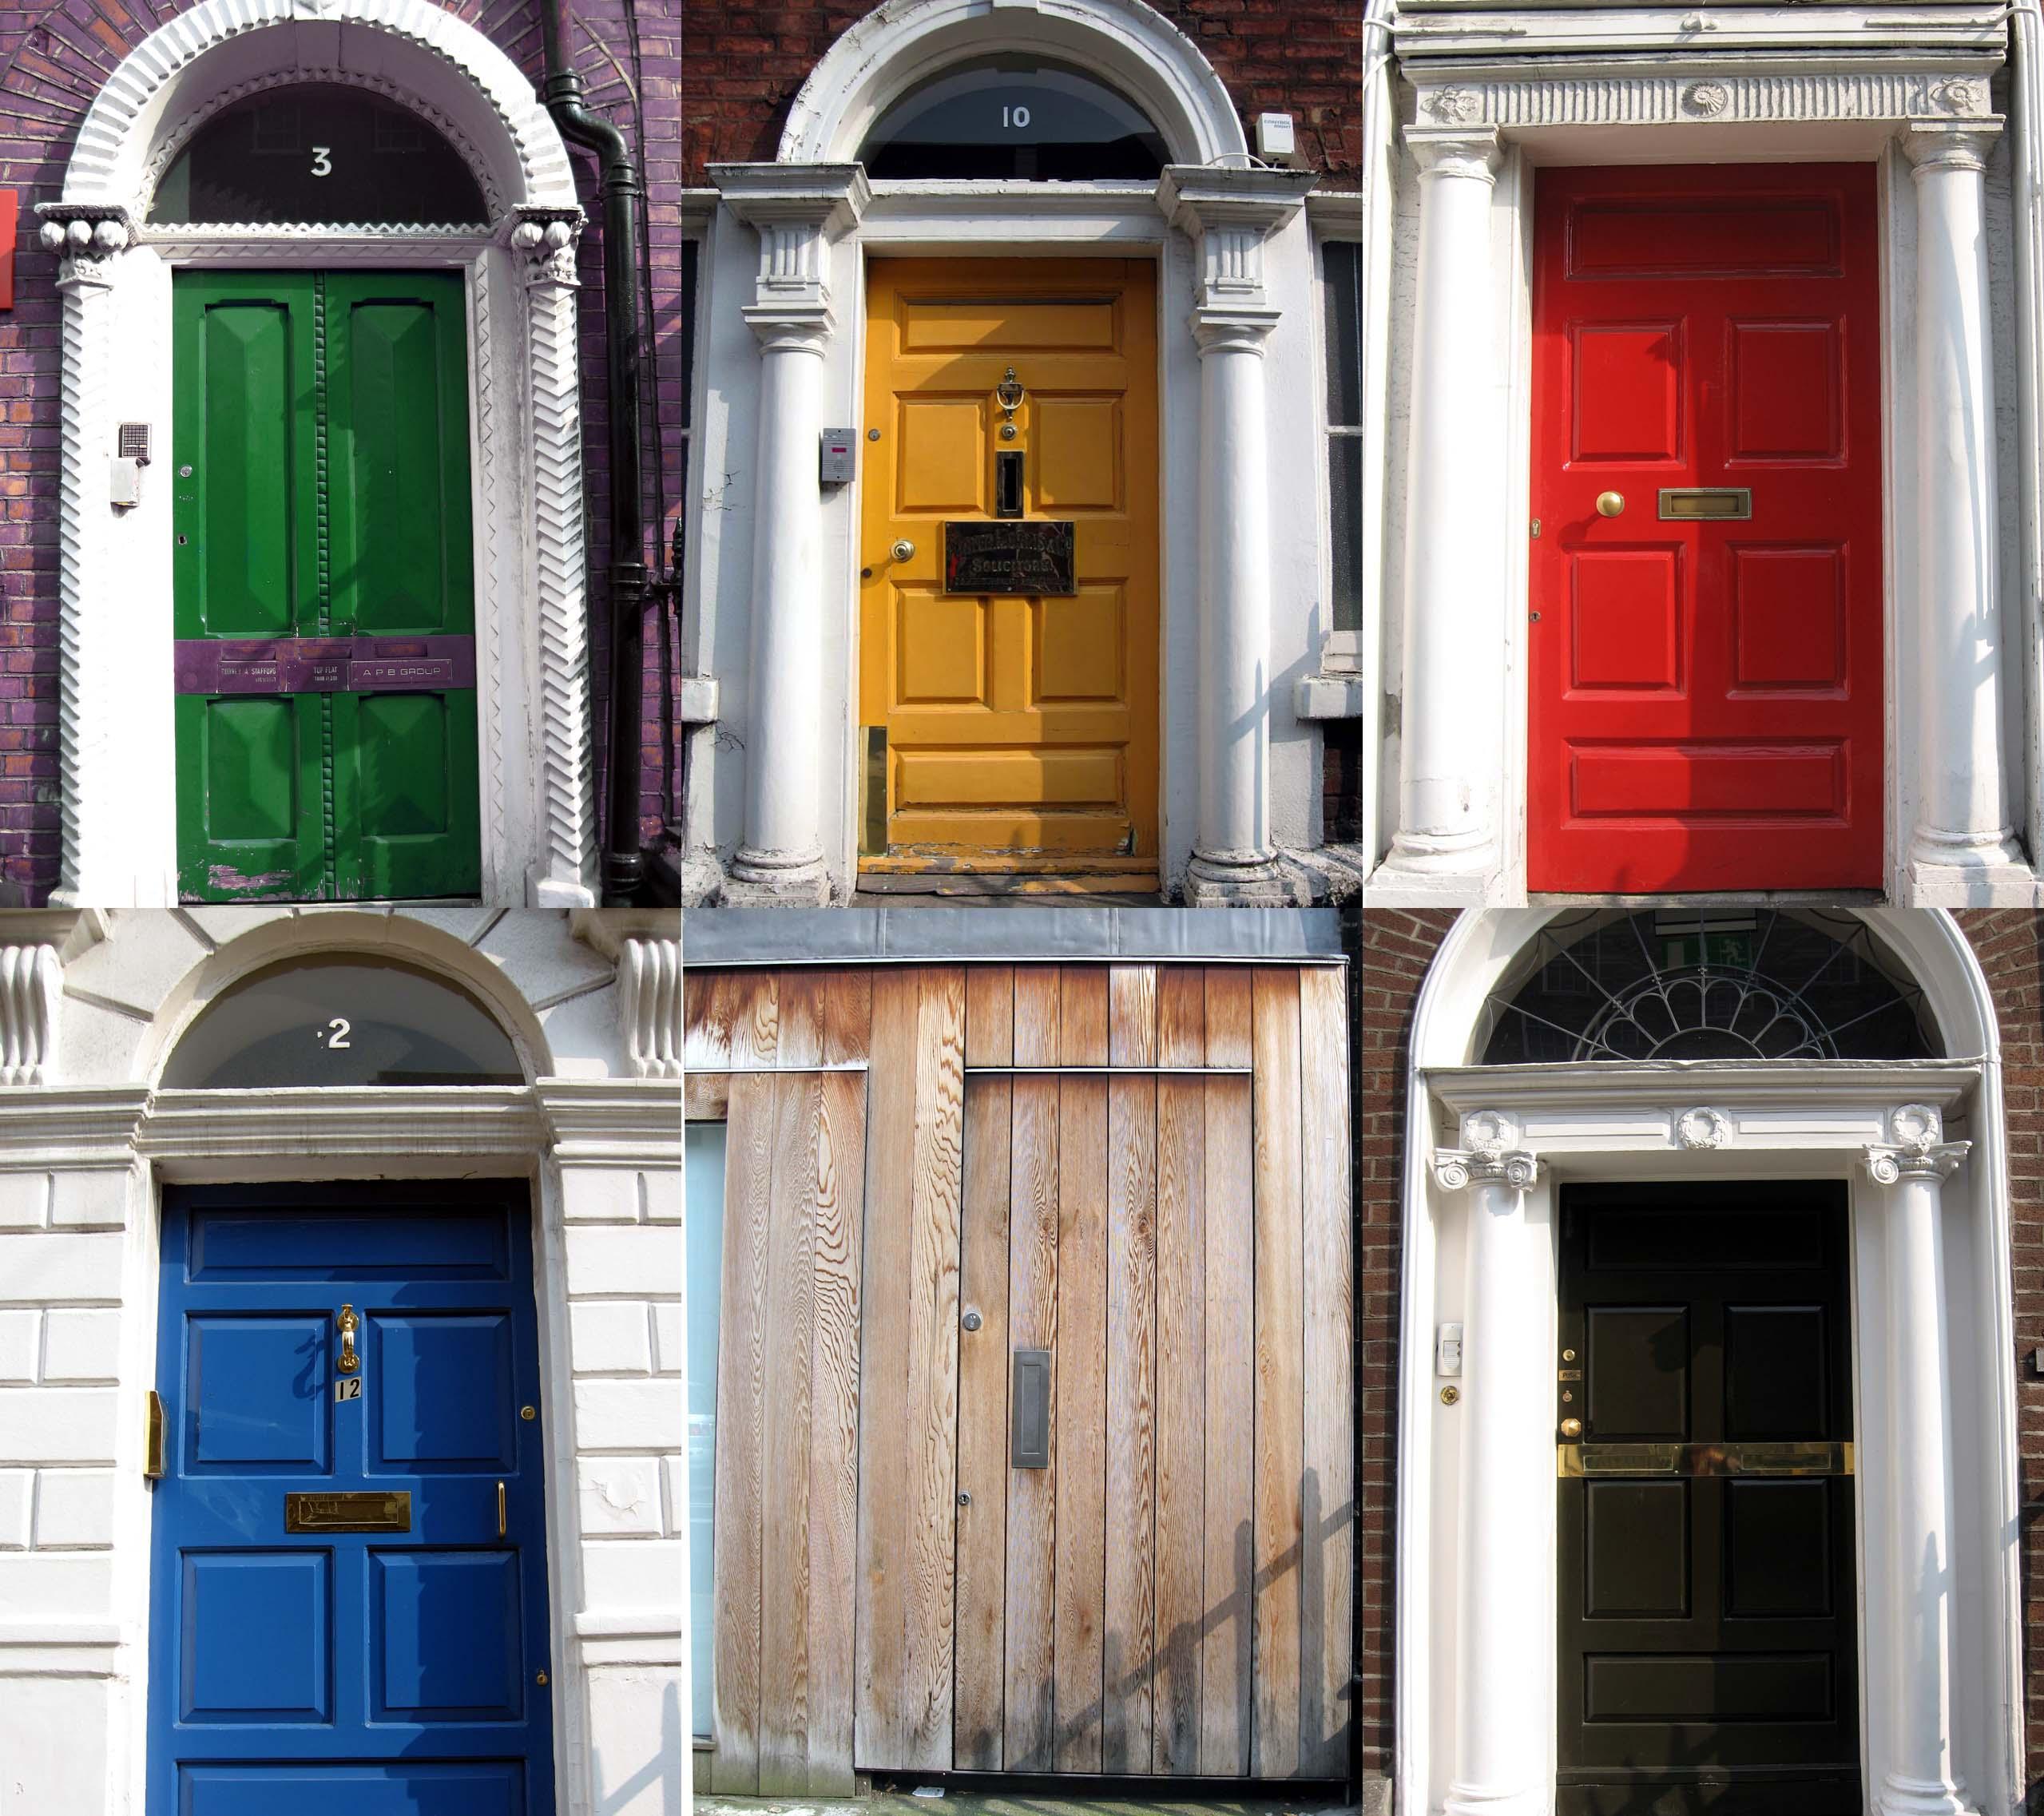 http://livingincolorwithsonu.typepad.com/.a/6a01156f94bd28970b0120a5f679e4970b-pi